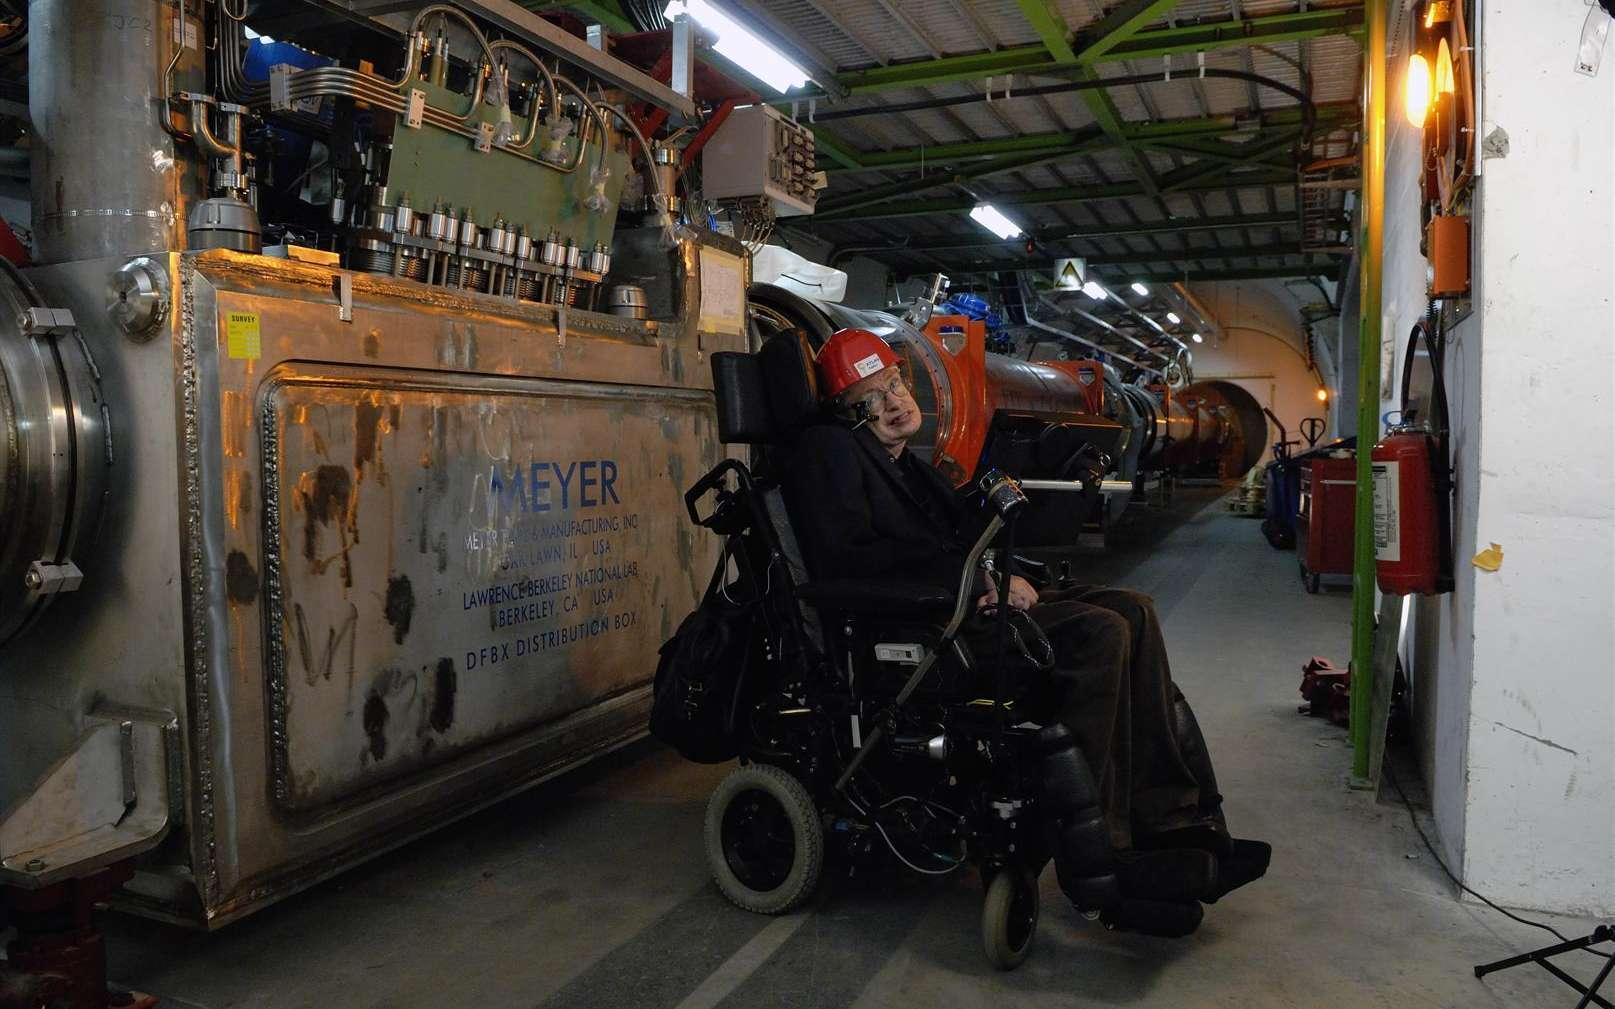 Stephen Hawking visite le LHC. Crédit : Cern